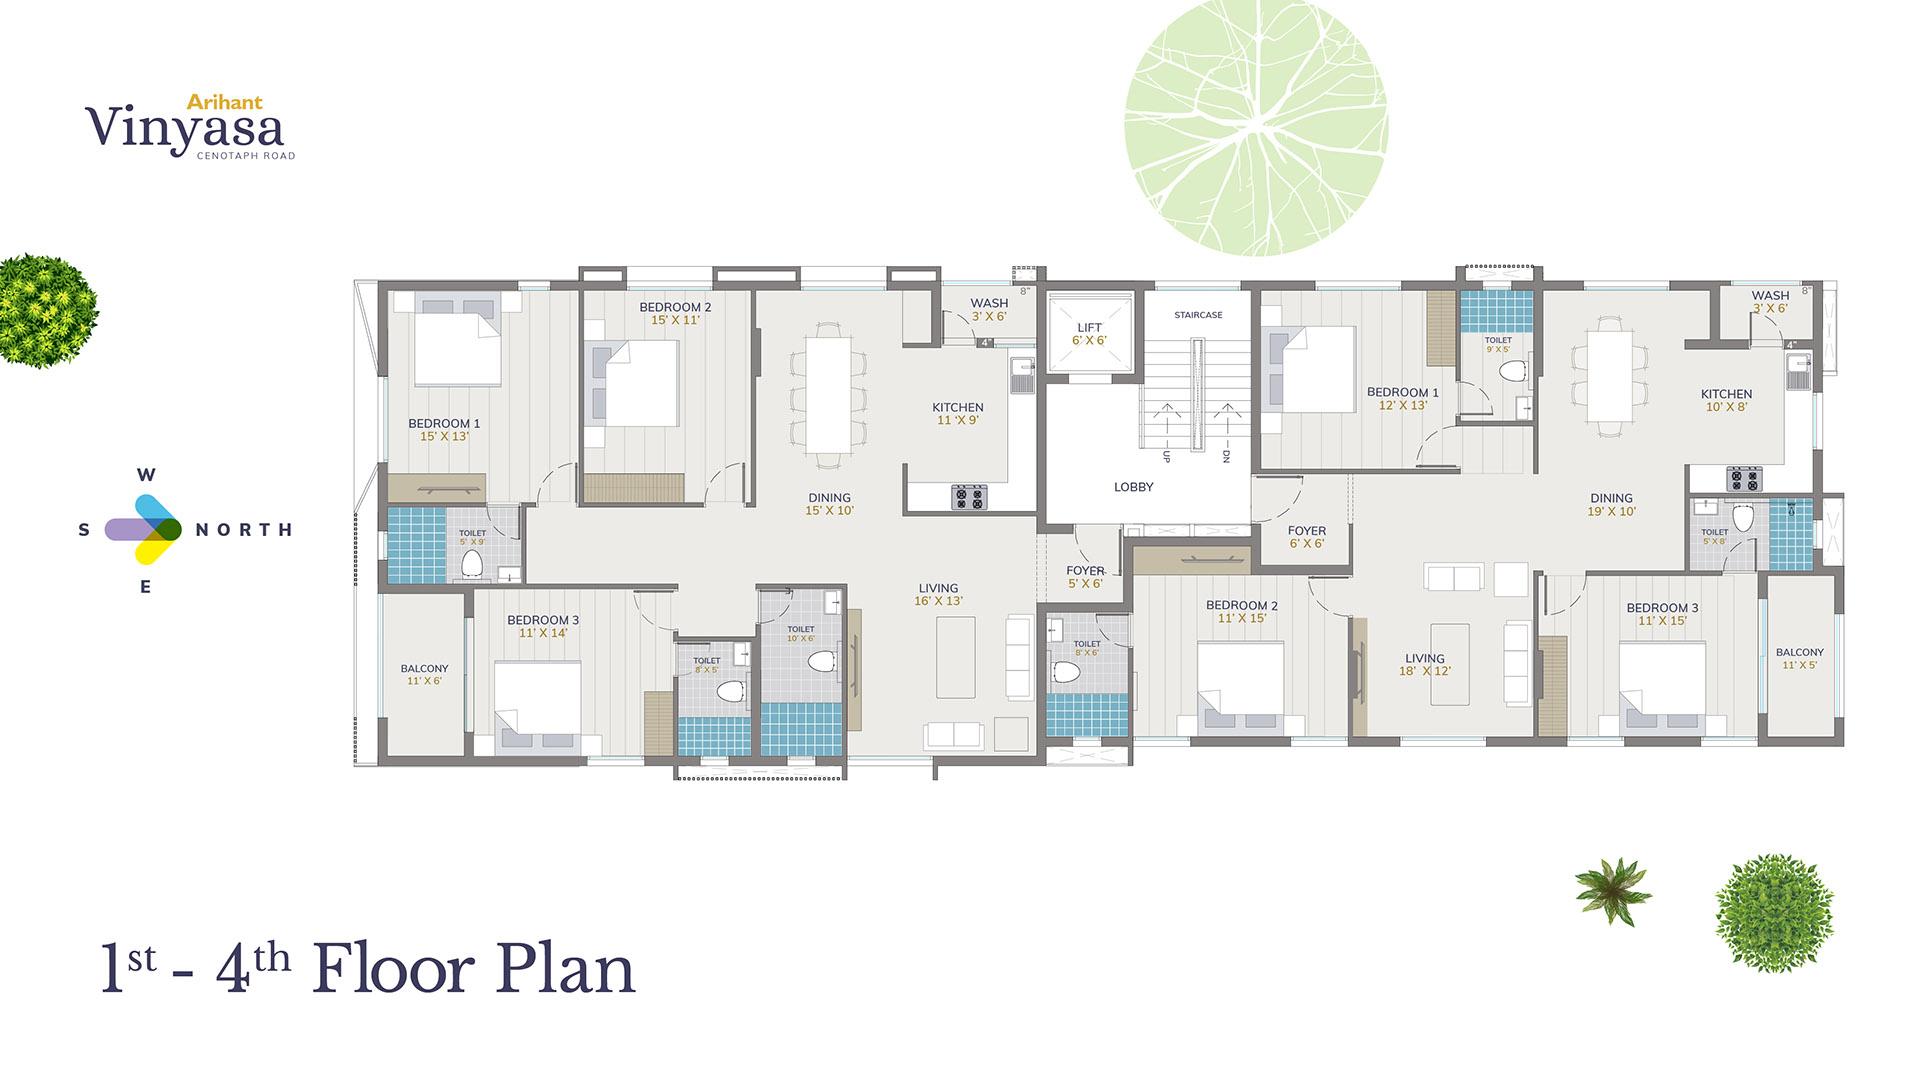 Vinyasa 1st - 4th Floor